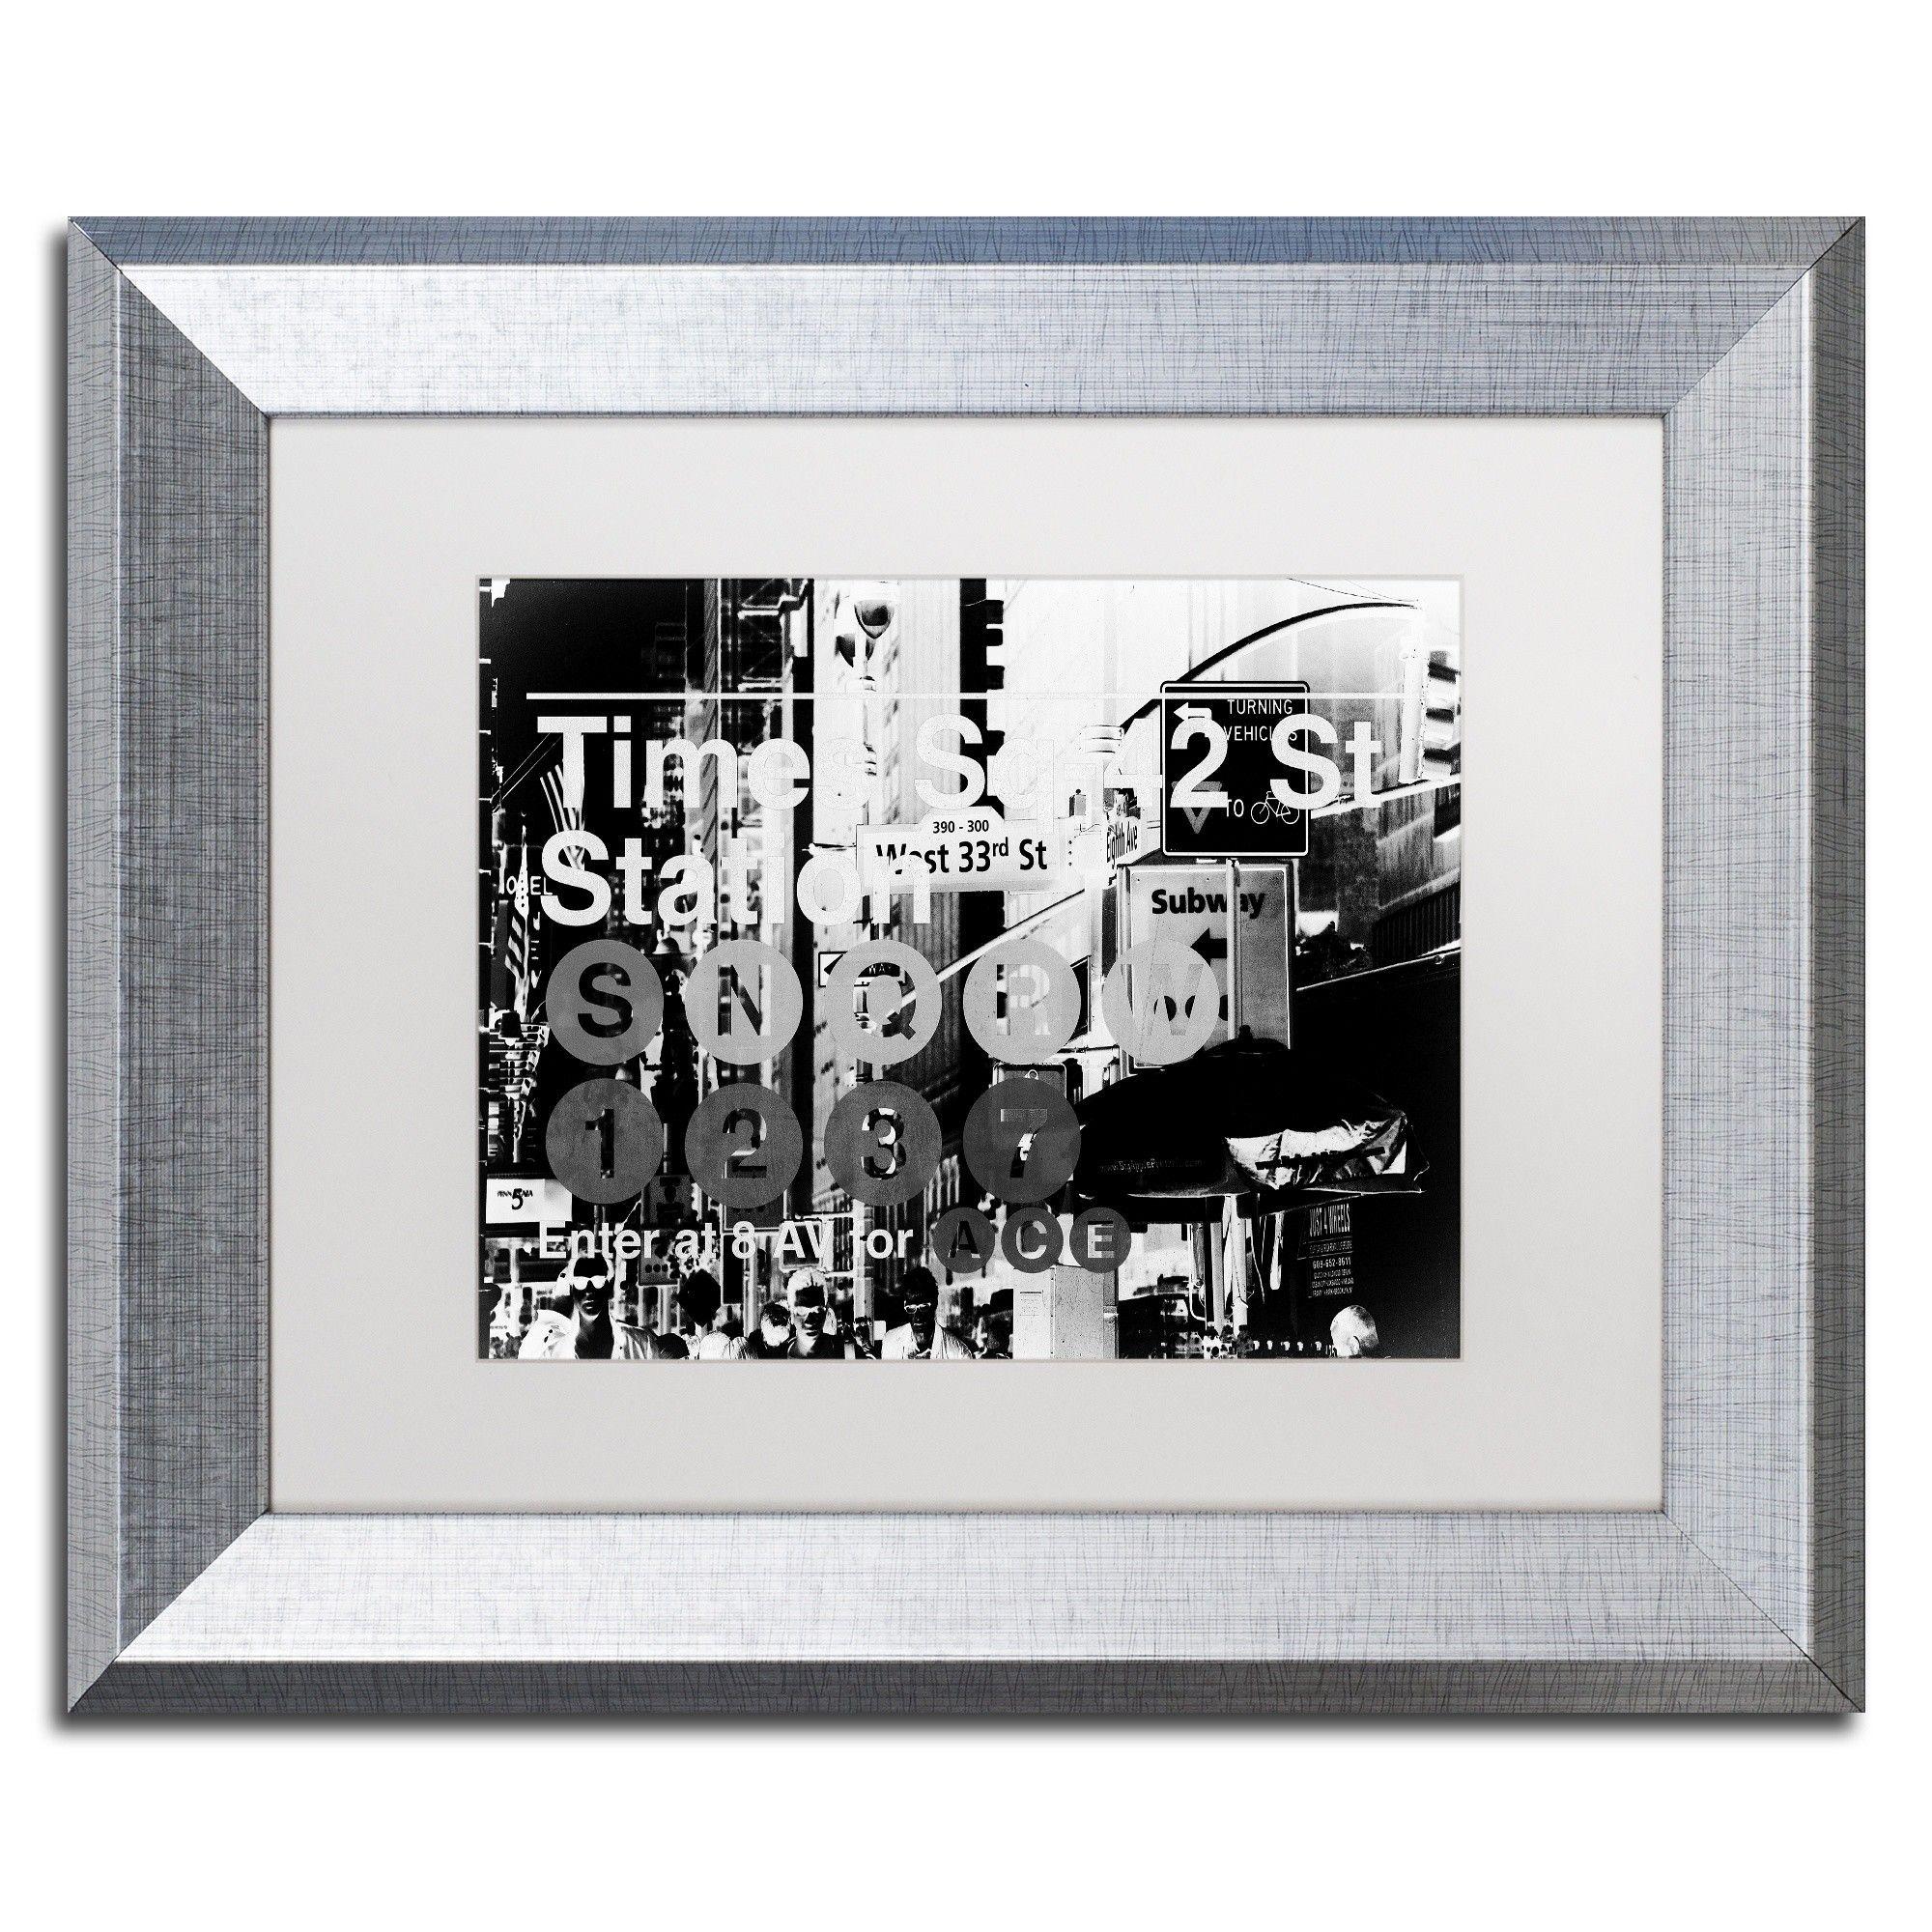 'Subway City Art NYC II' by Philippe Hugonnard Giclée Framed Photographic Print